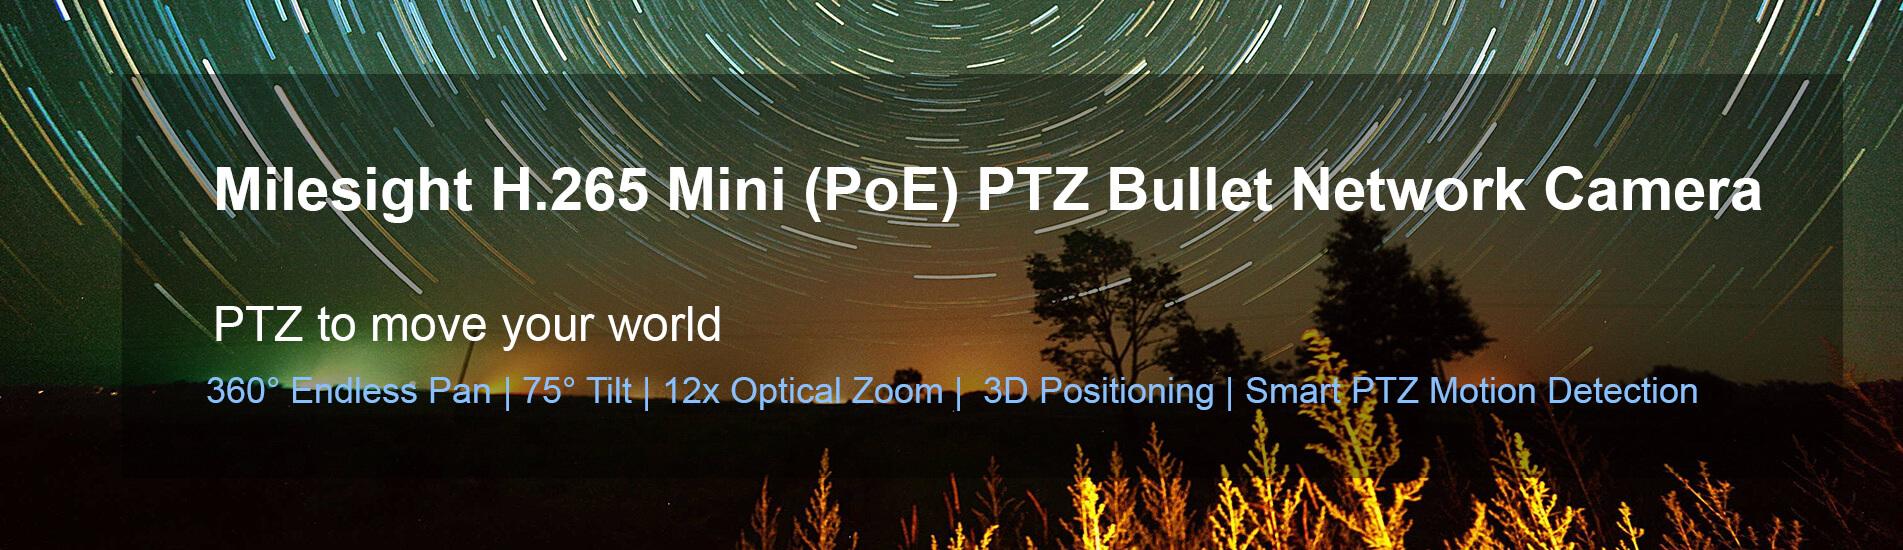 PTZ Bullet Network Camera Banner